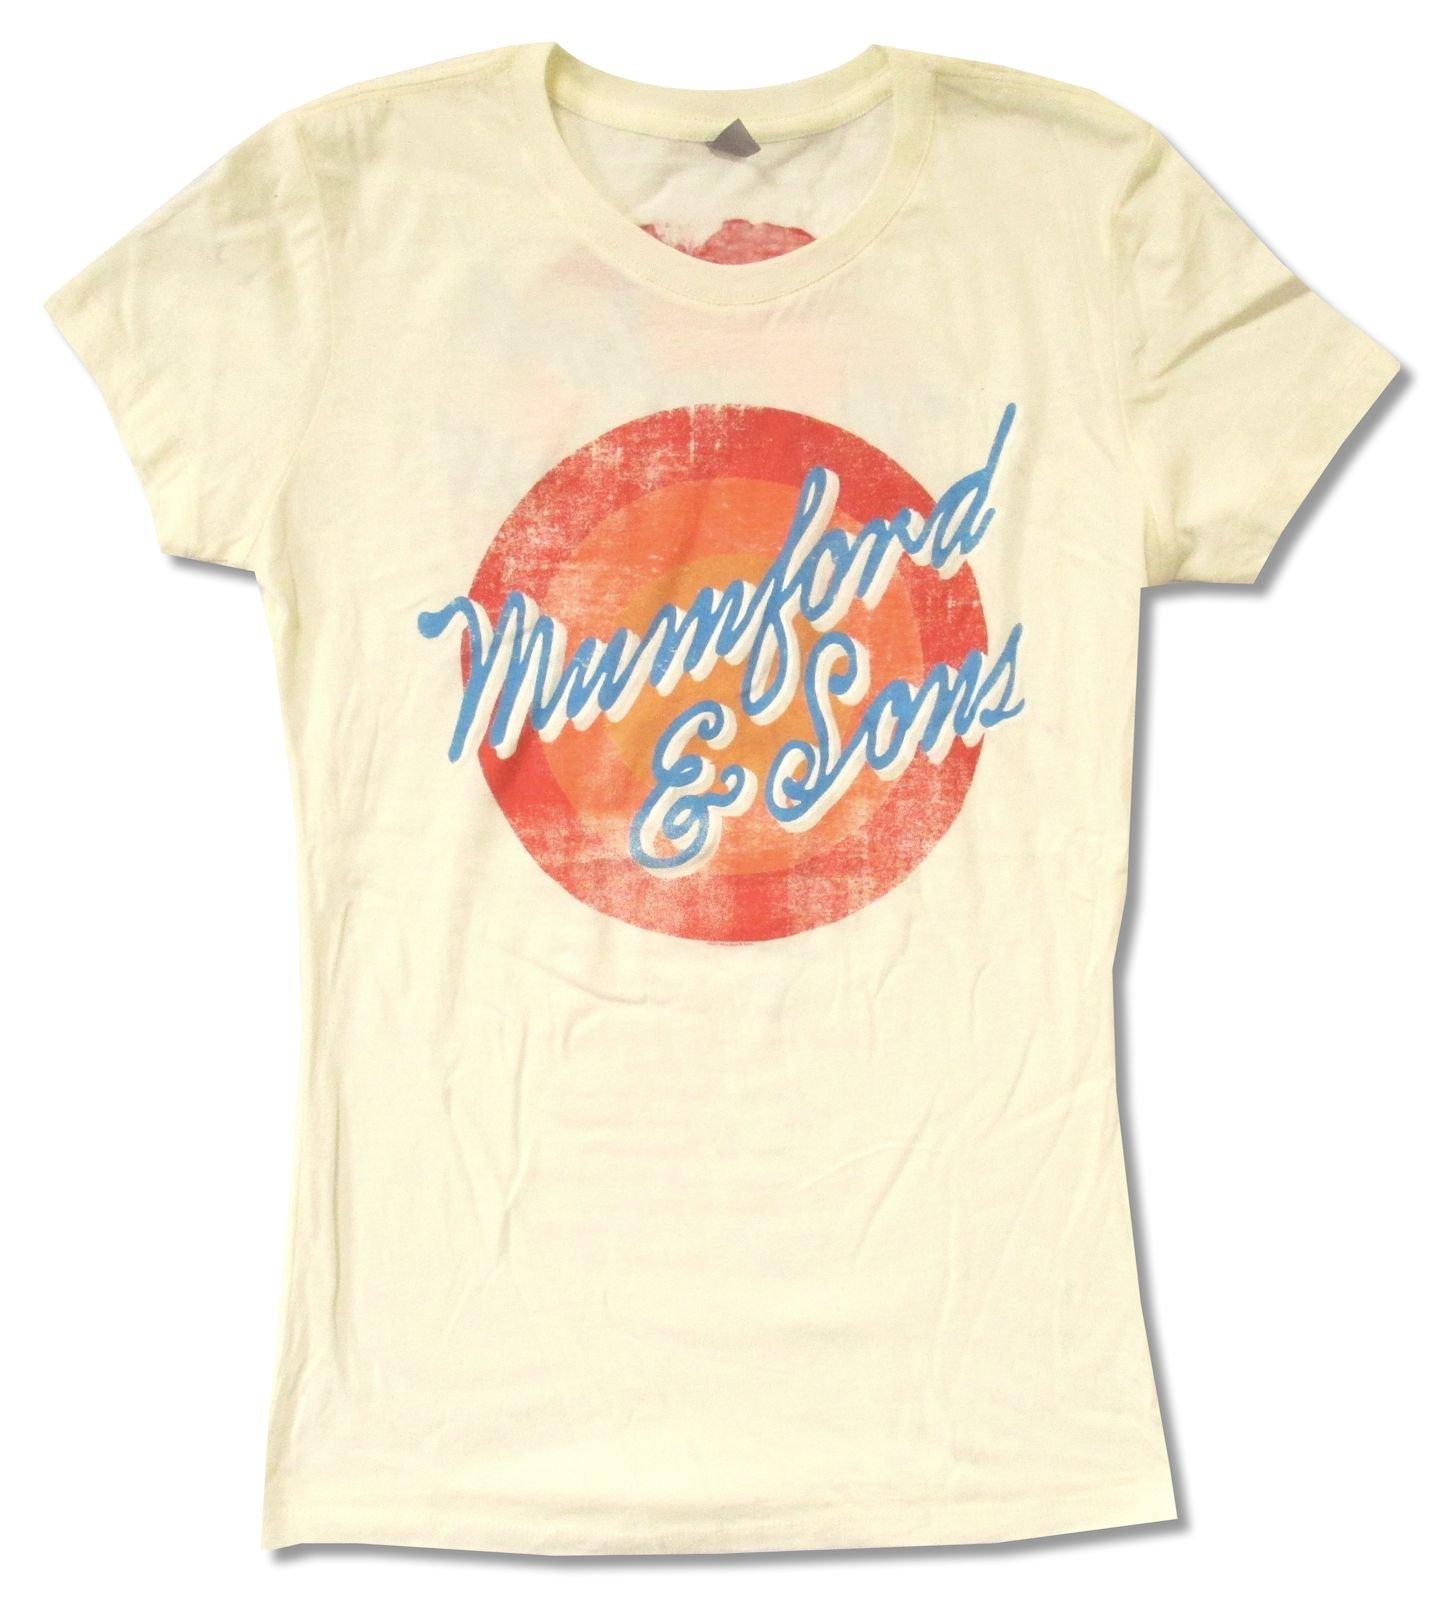 Mum Sons Sun Script Tour 2012 Cream Baby Doll T Shirt 2065